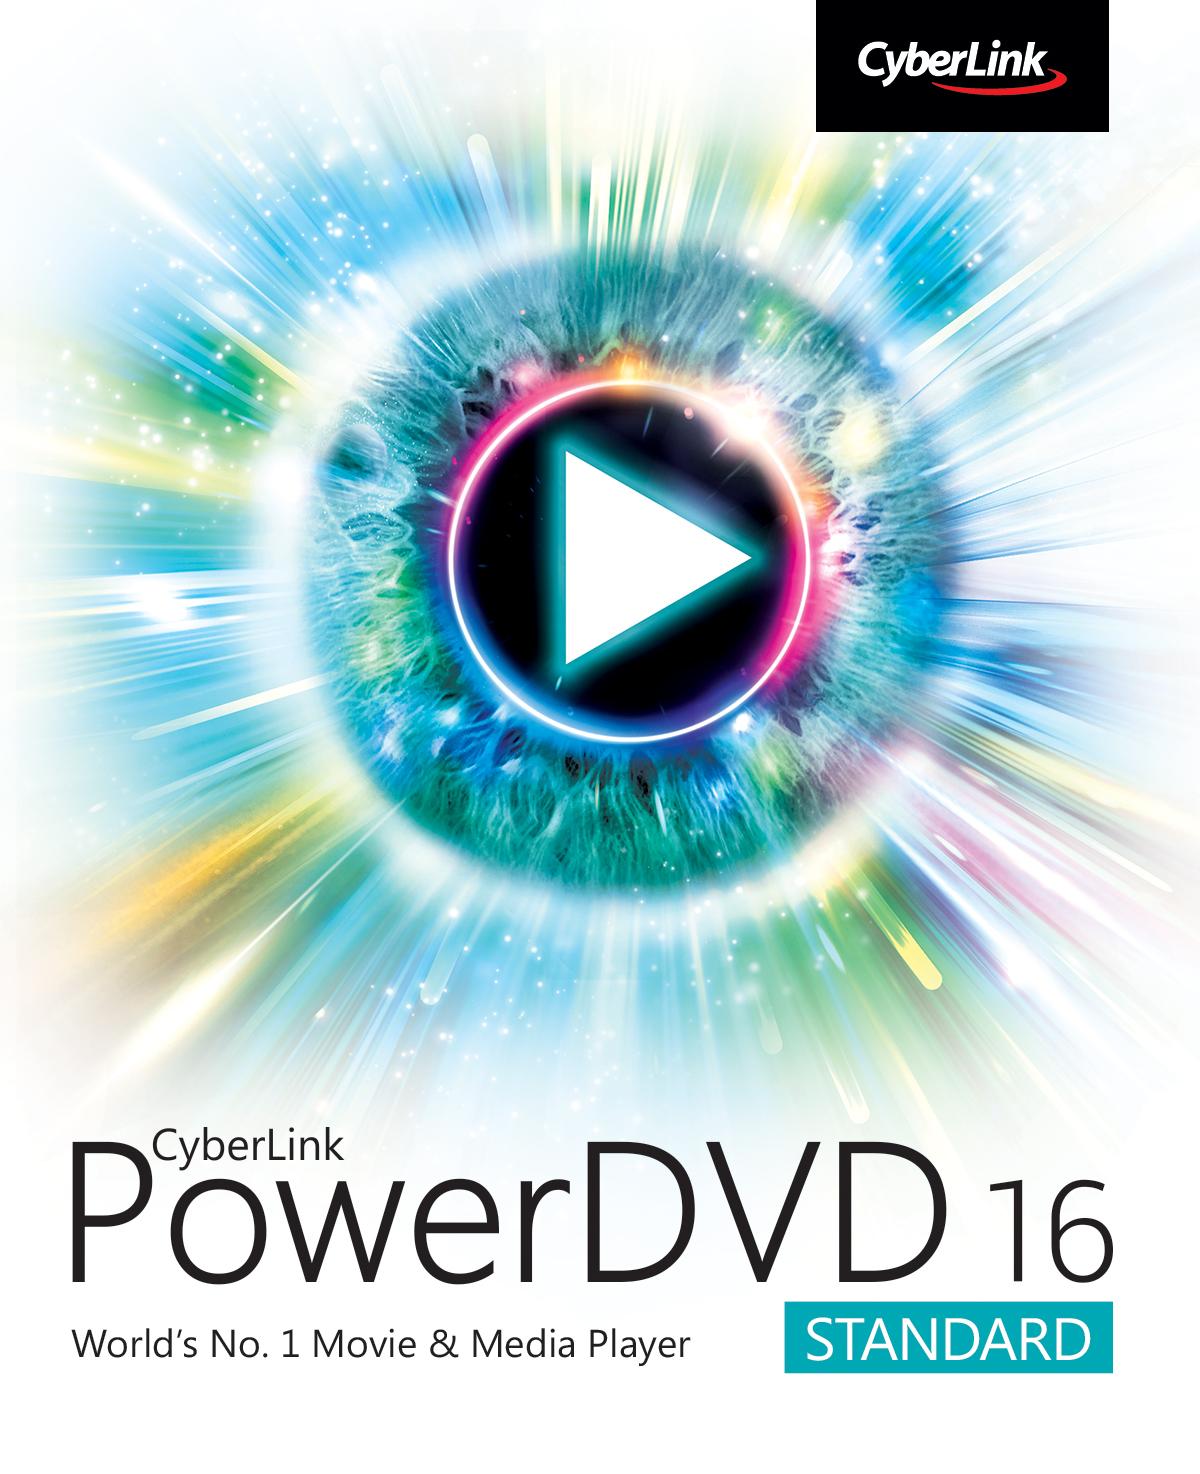 cyberlink-powerdvd-16-standard-download